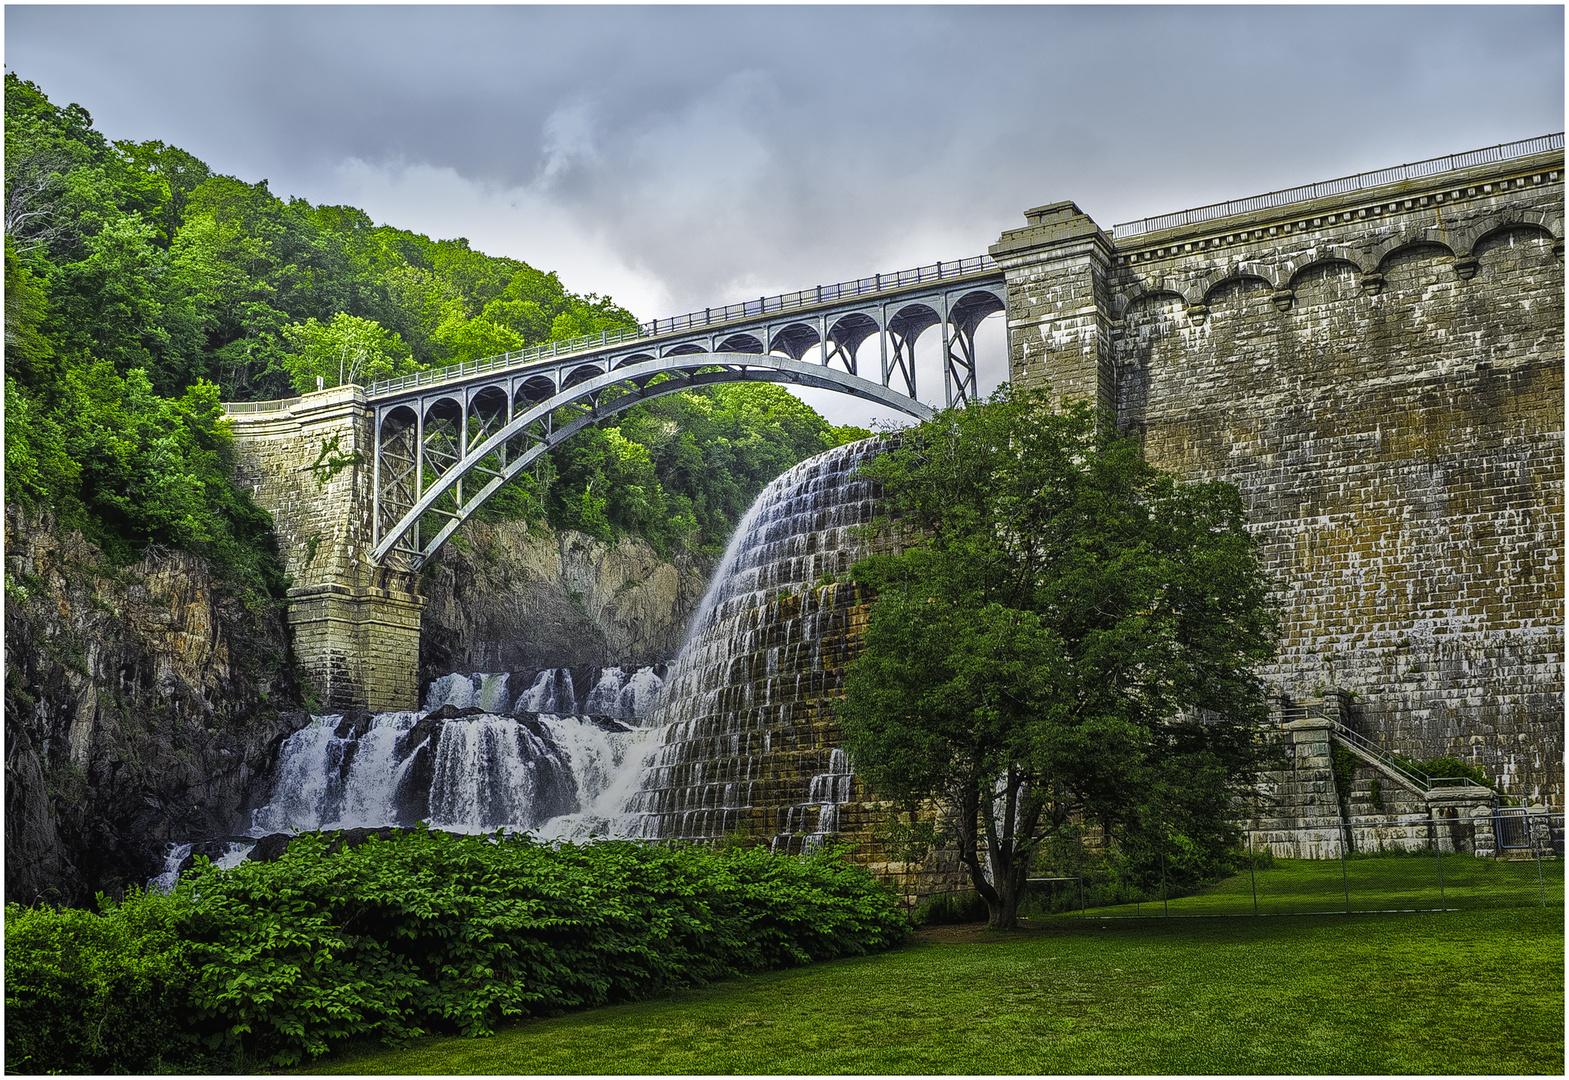 The Dam at Croton-on-Hudson